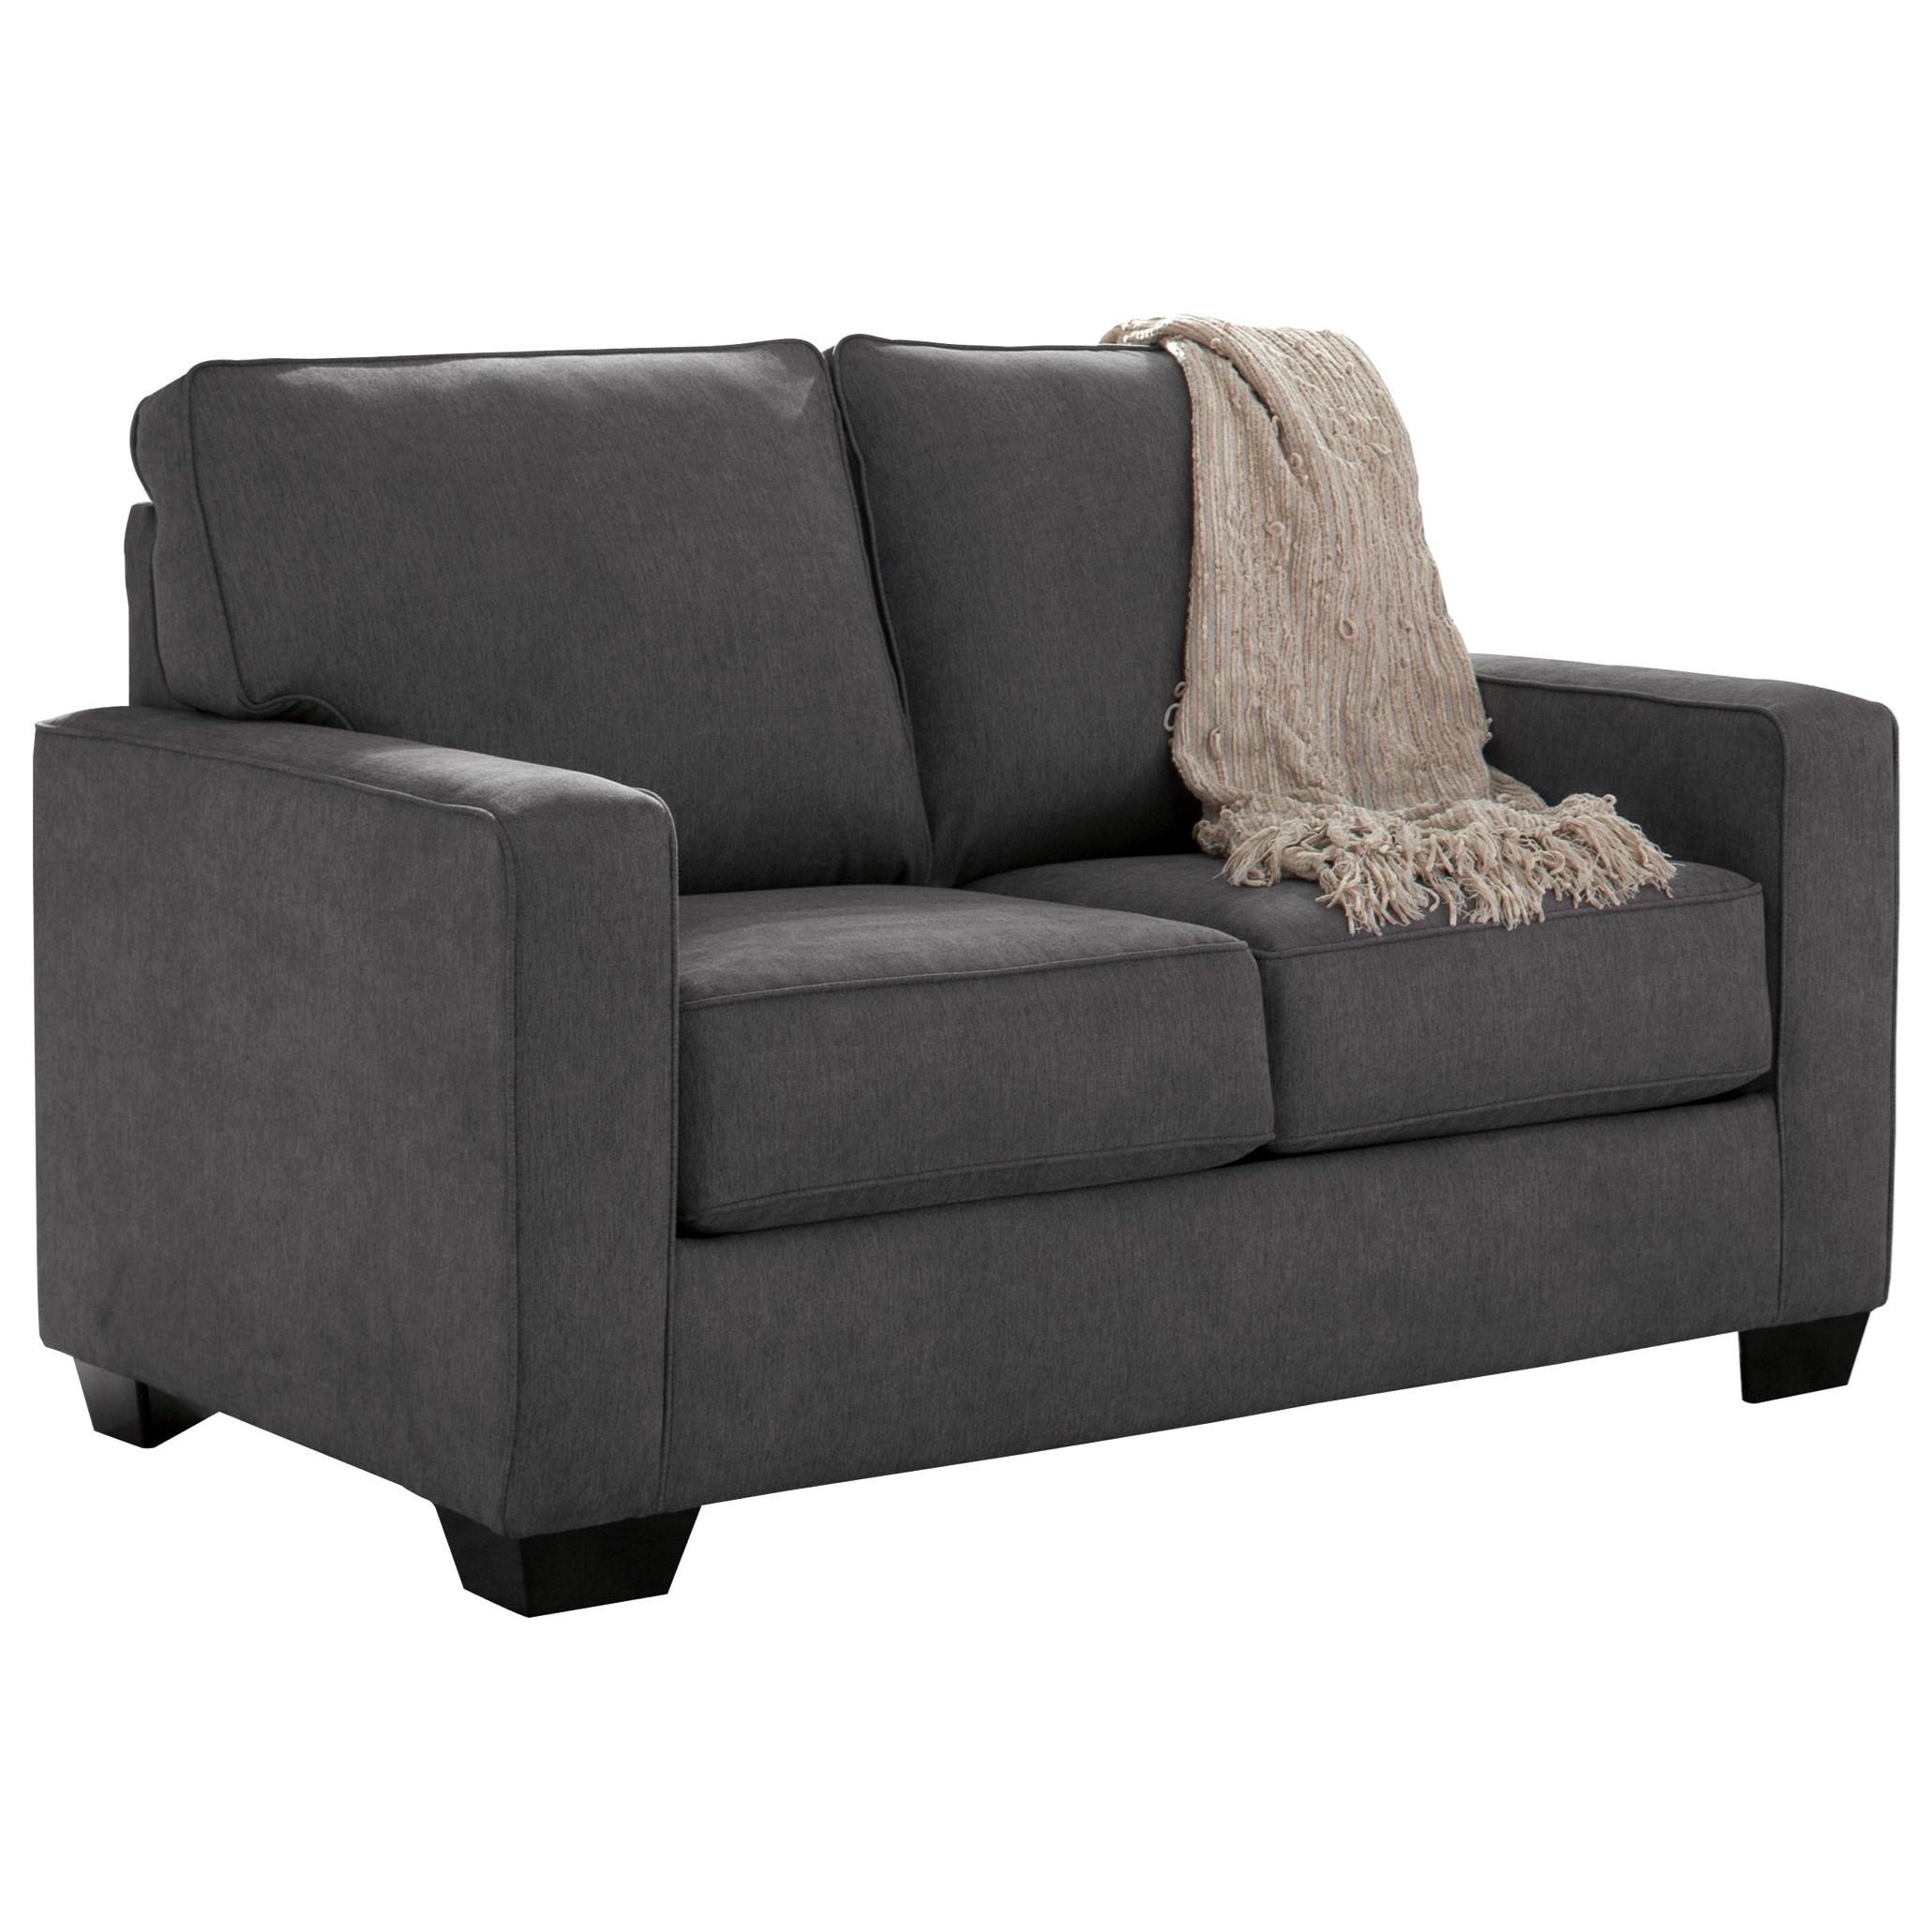 Gentil Signature Design By Ashley Zeb Twin Sofa Sleeper With Memory Foam Mattress